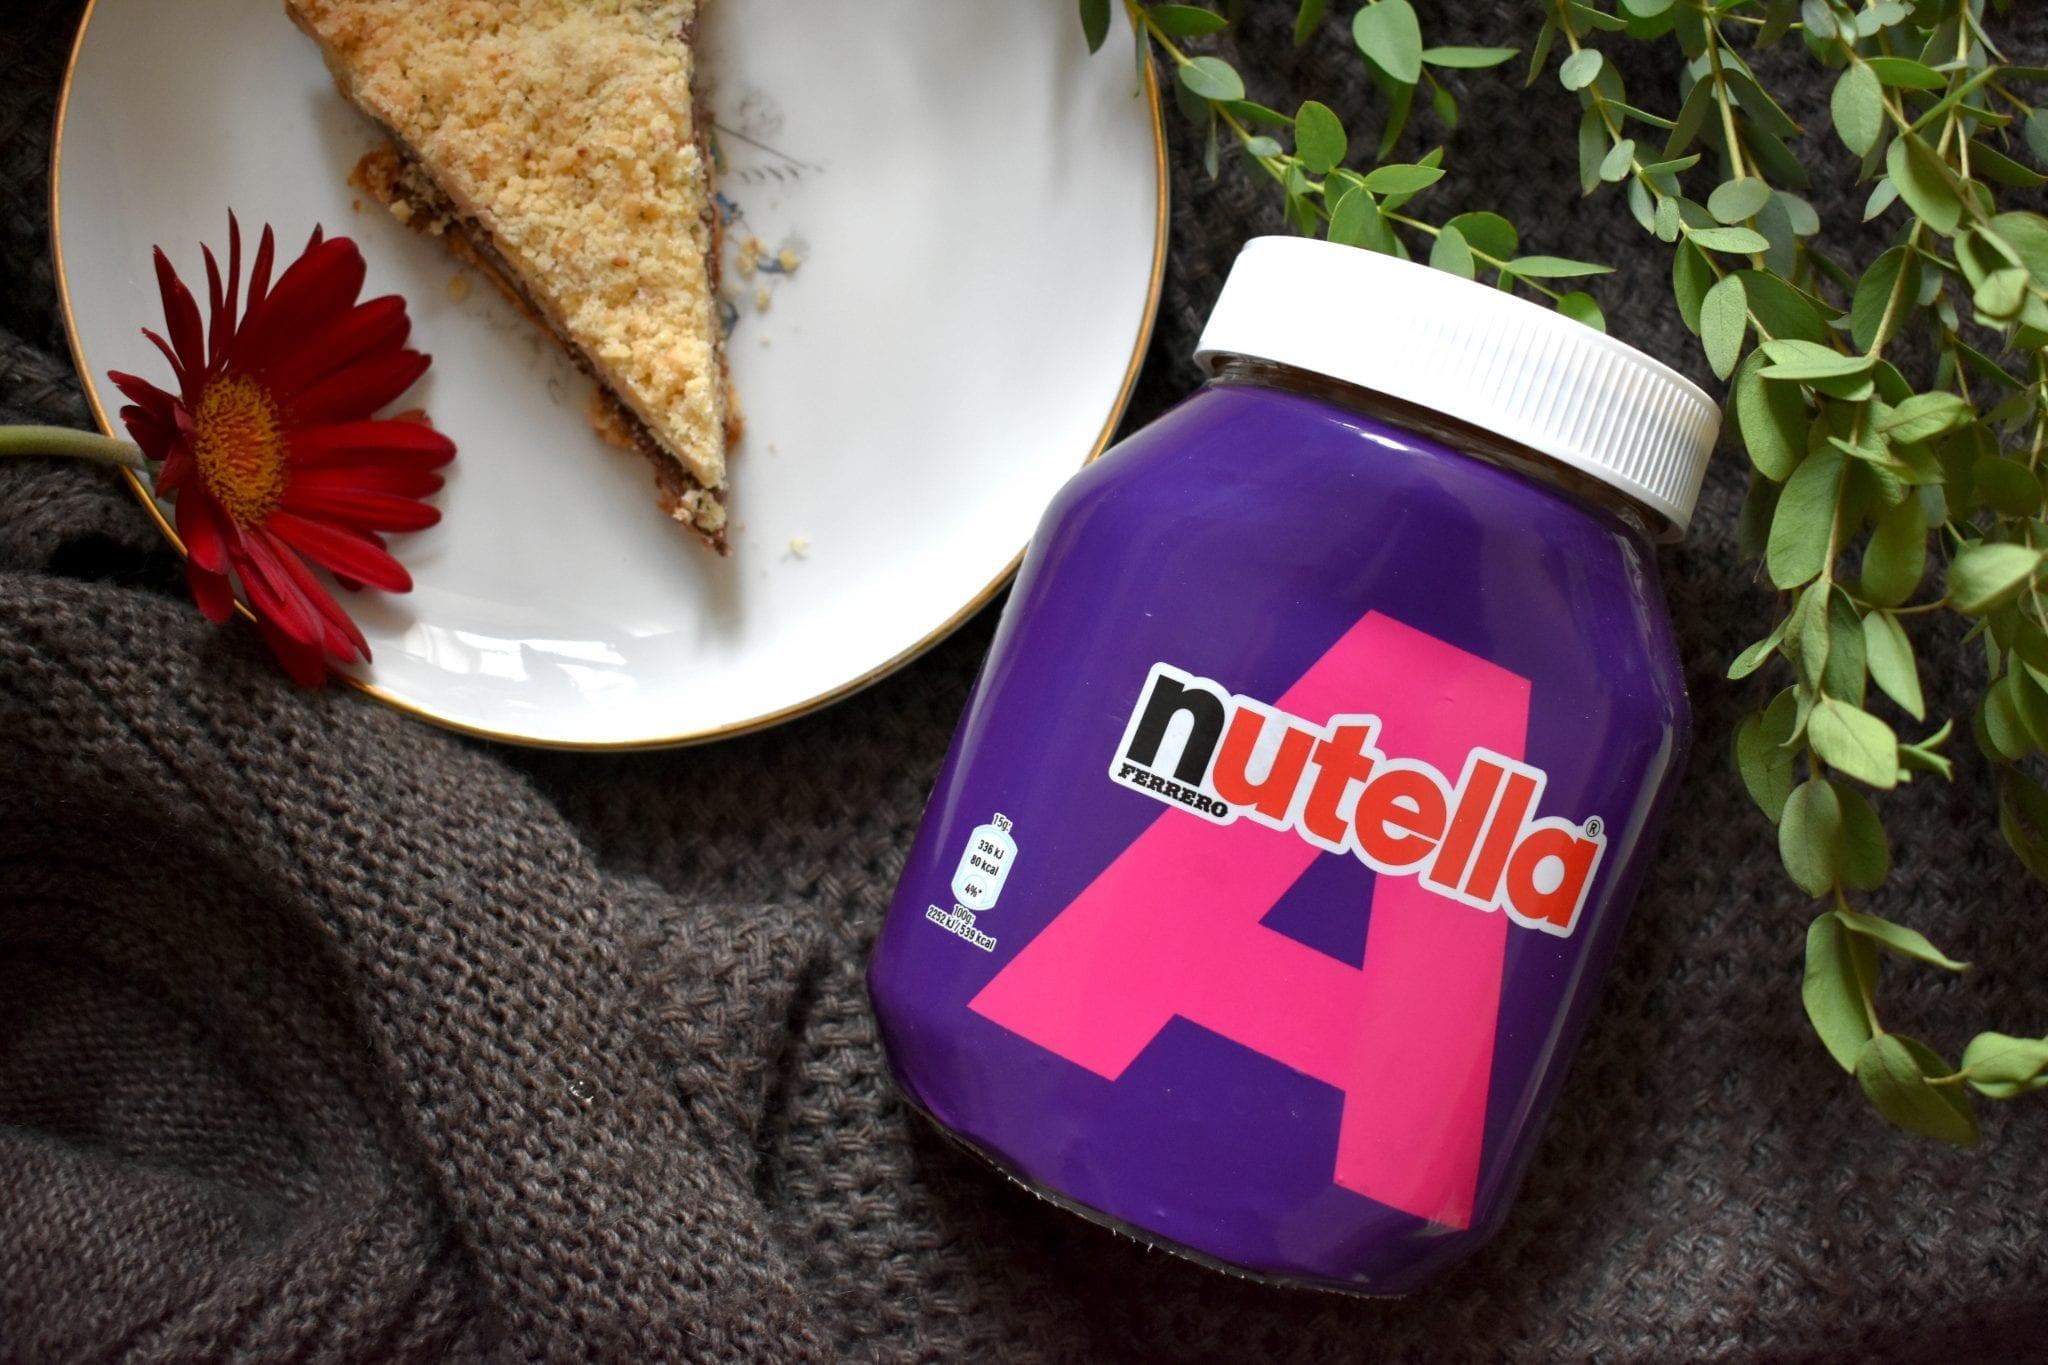 Cena Nutella - Le Plume